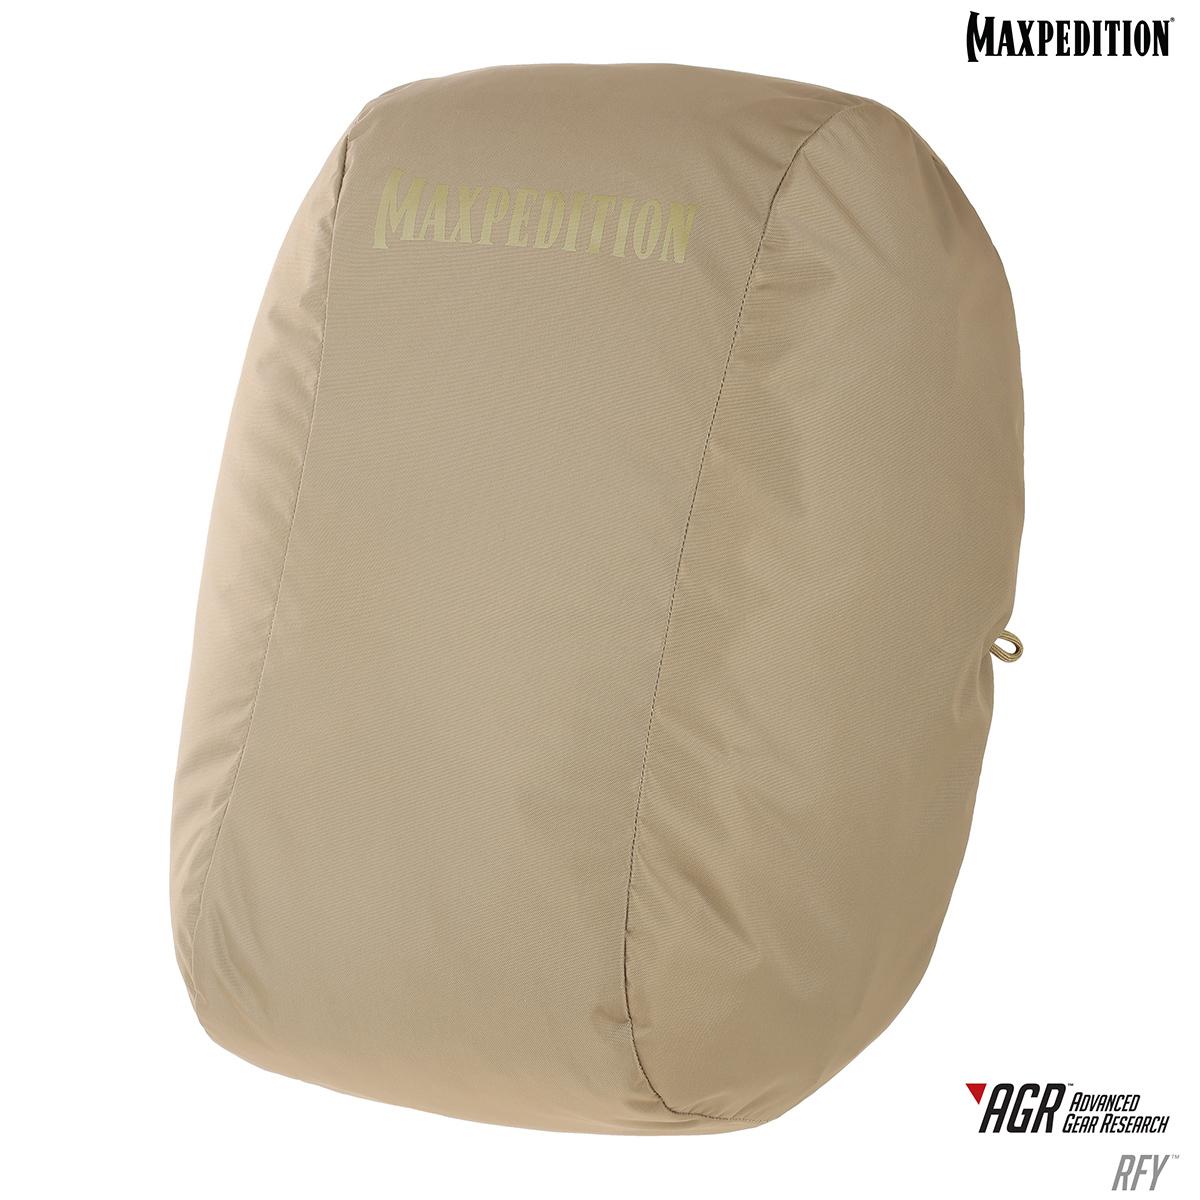 Nepromokavý potah na batoh Maxpedition Rain Cover RFY Tan ☆ Anod.cz 17b02c8b0c